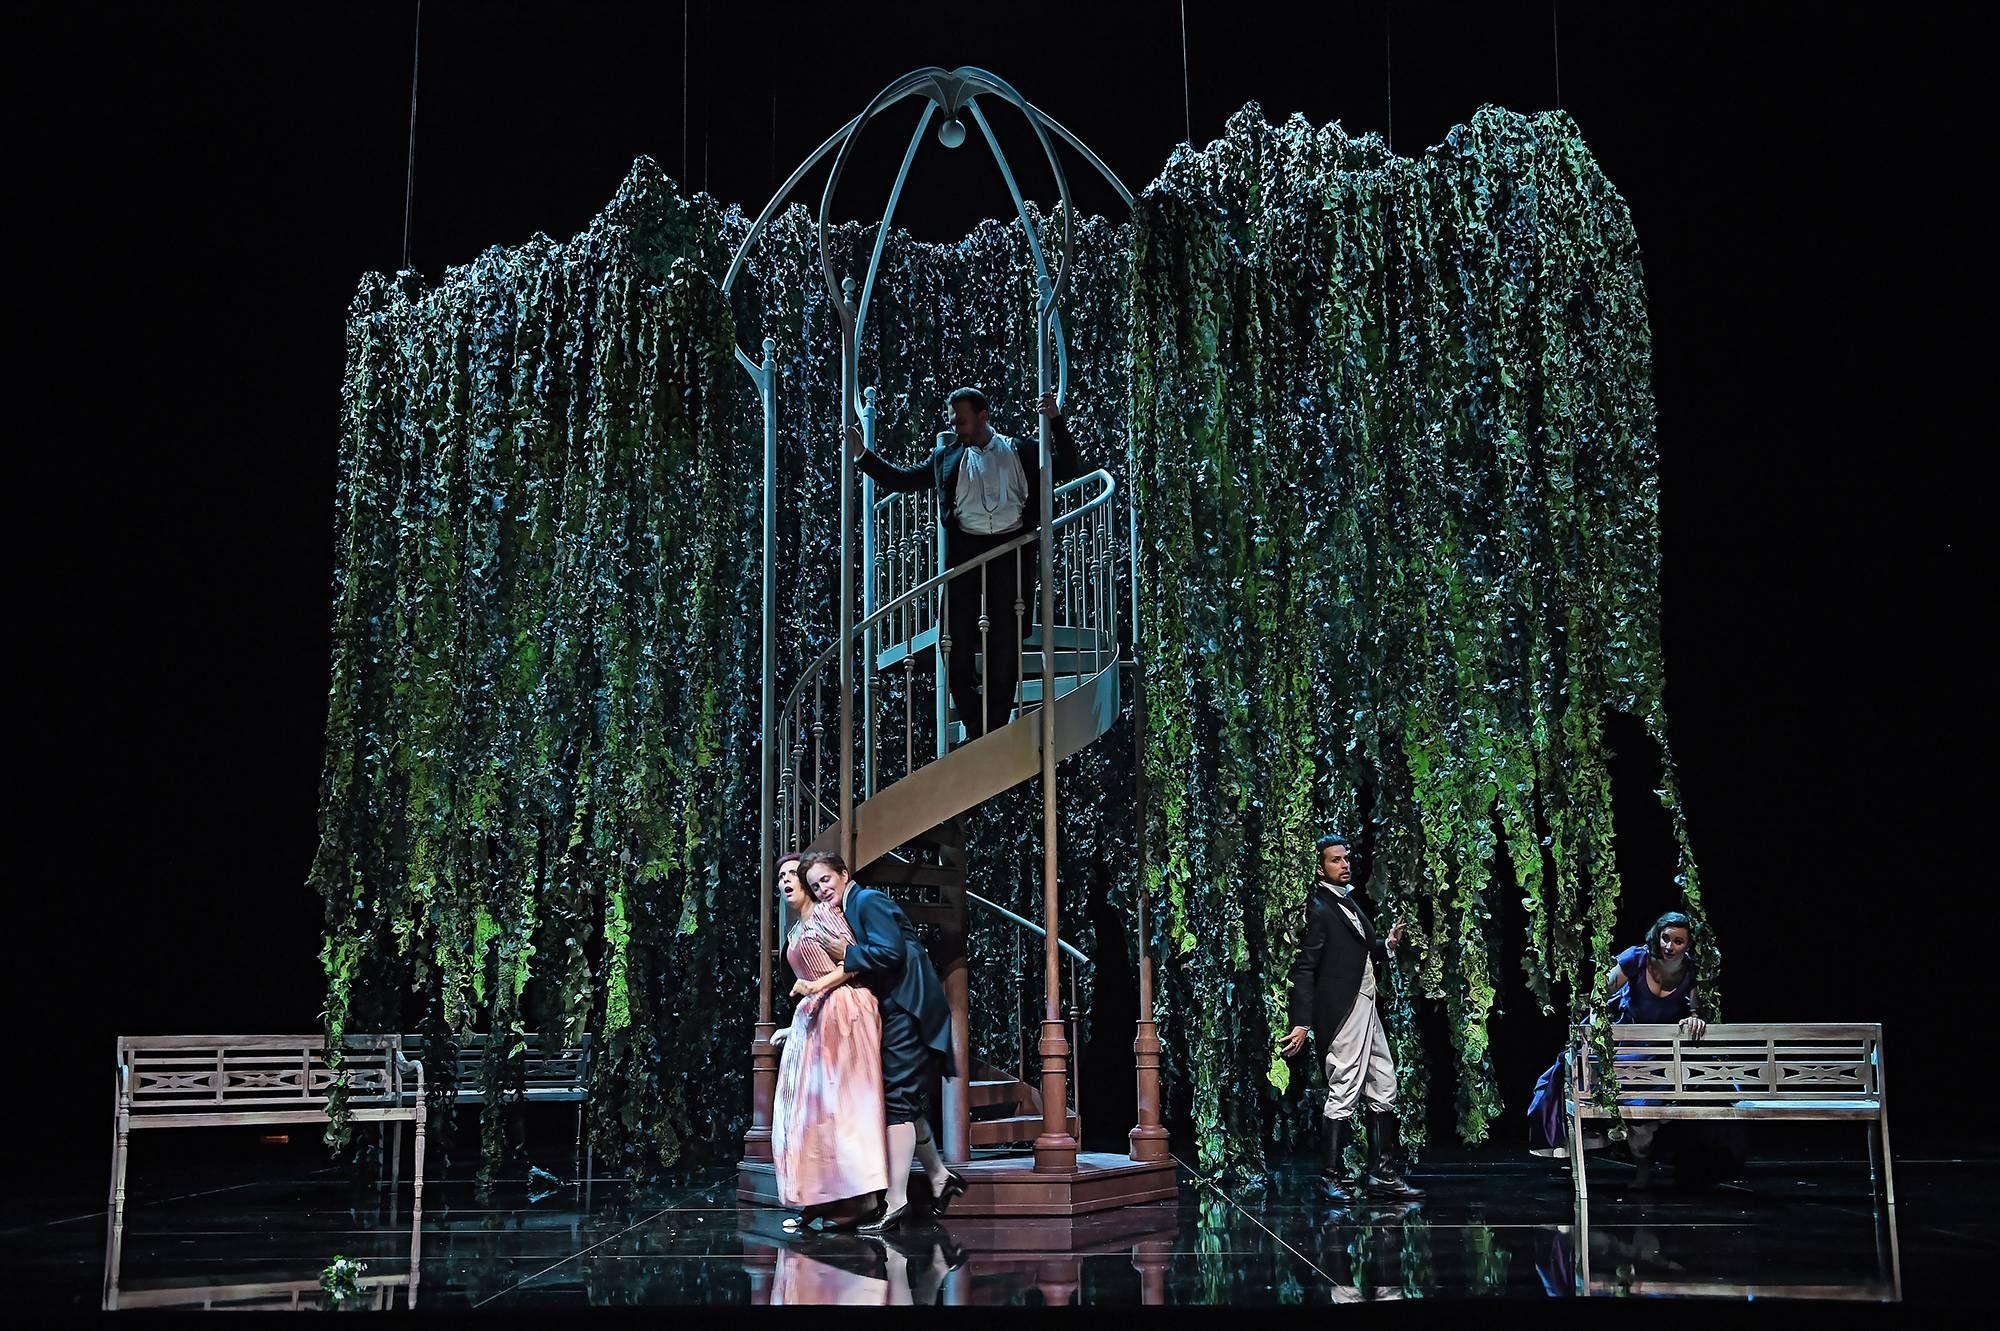 le nozze di figaro,theater st gallen, regie: nicole claudia weber,foto:Andreas J. Ettler